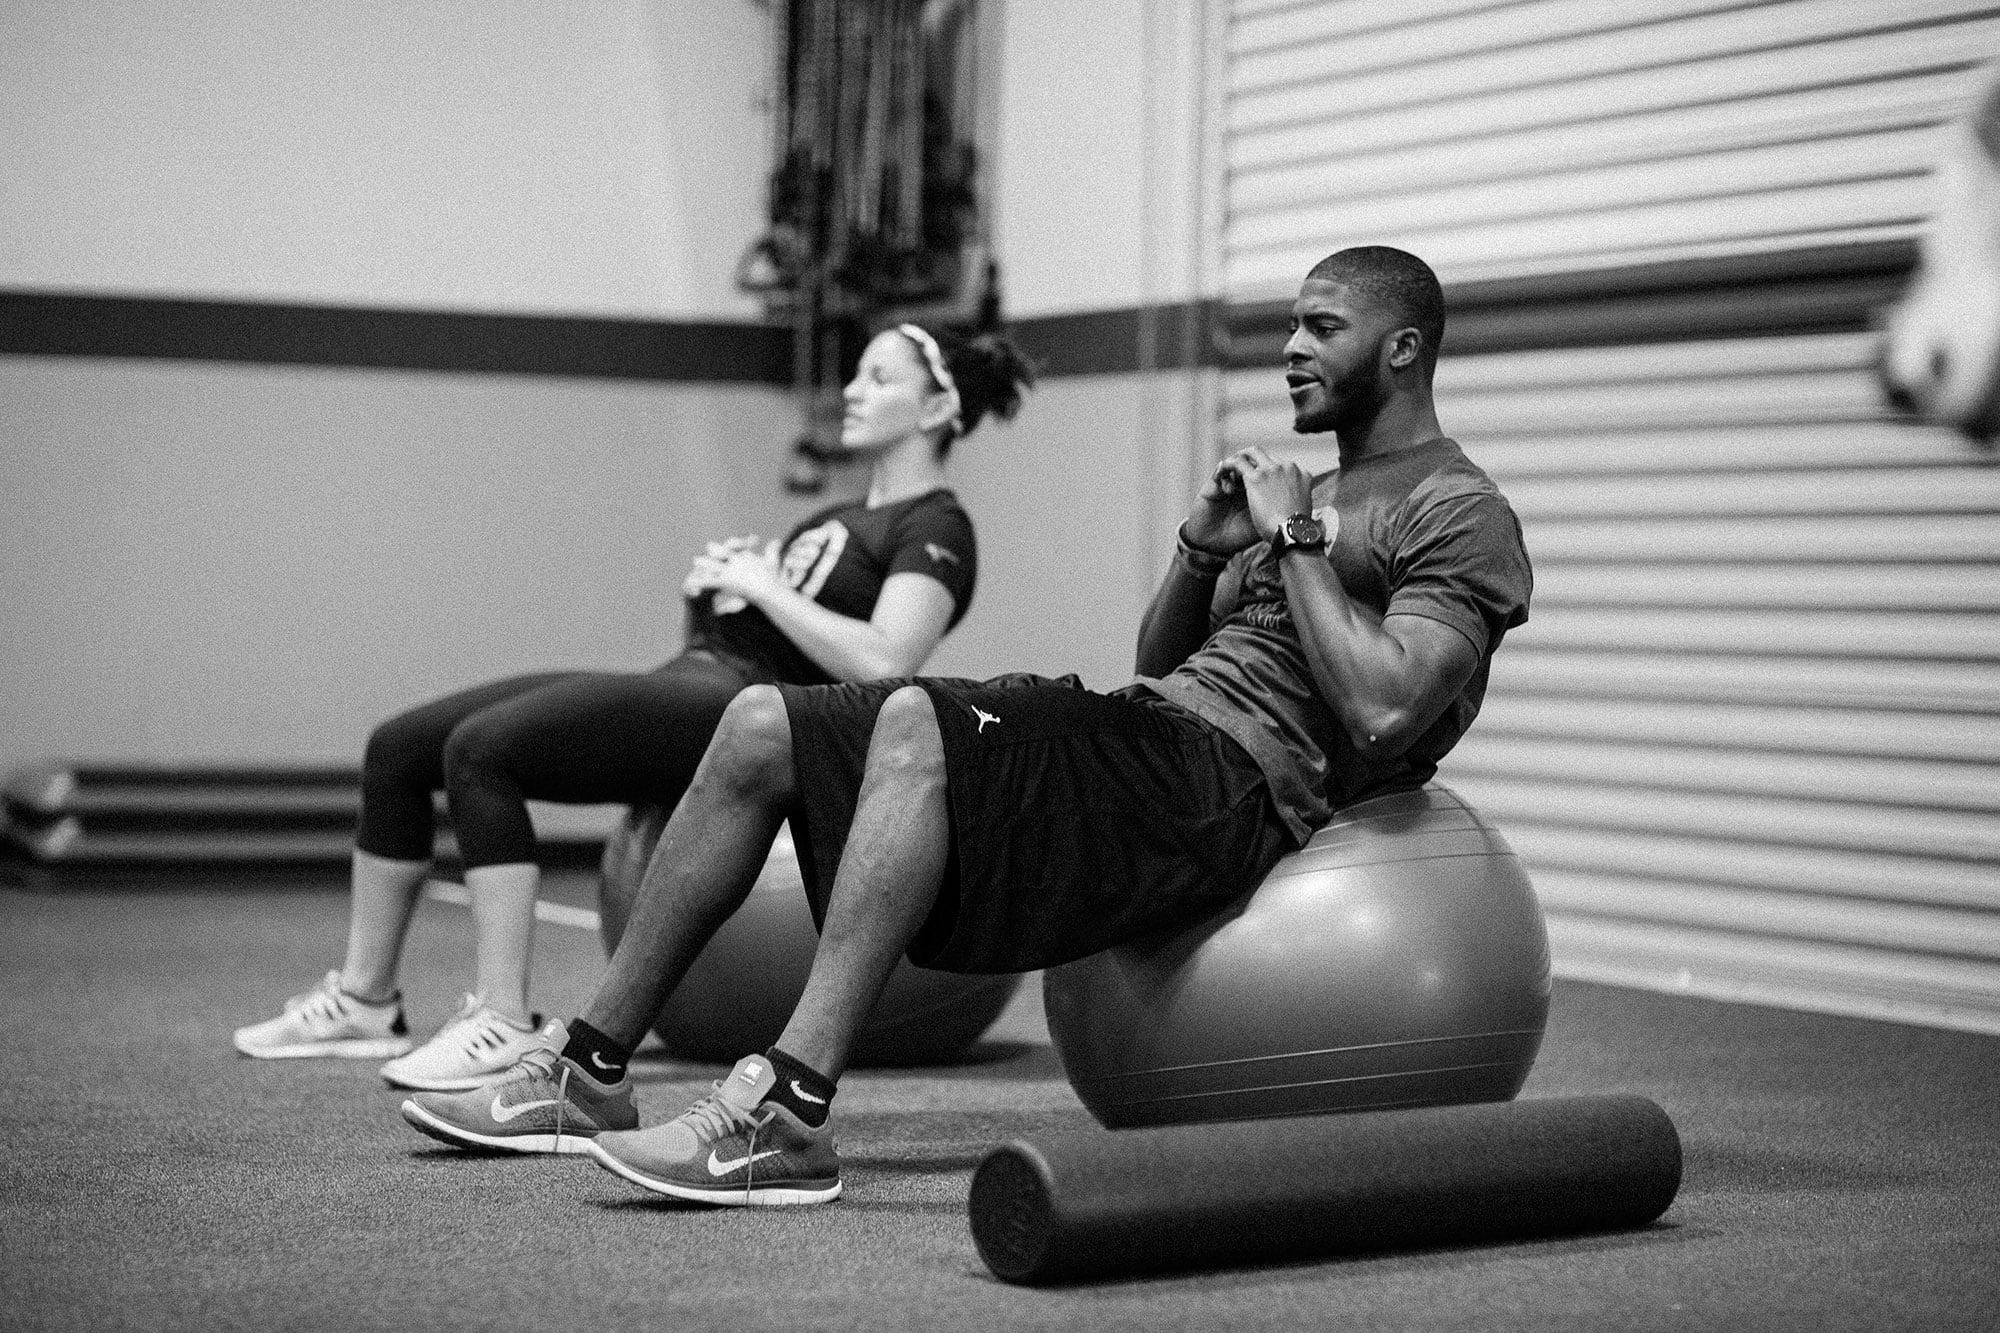 Workout_Action_ZRS_0002.JPG